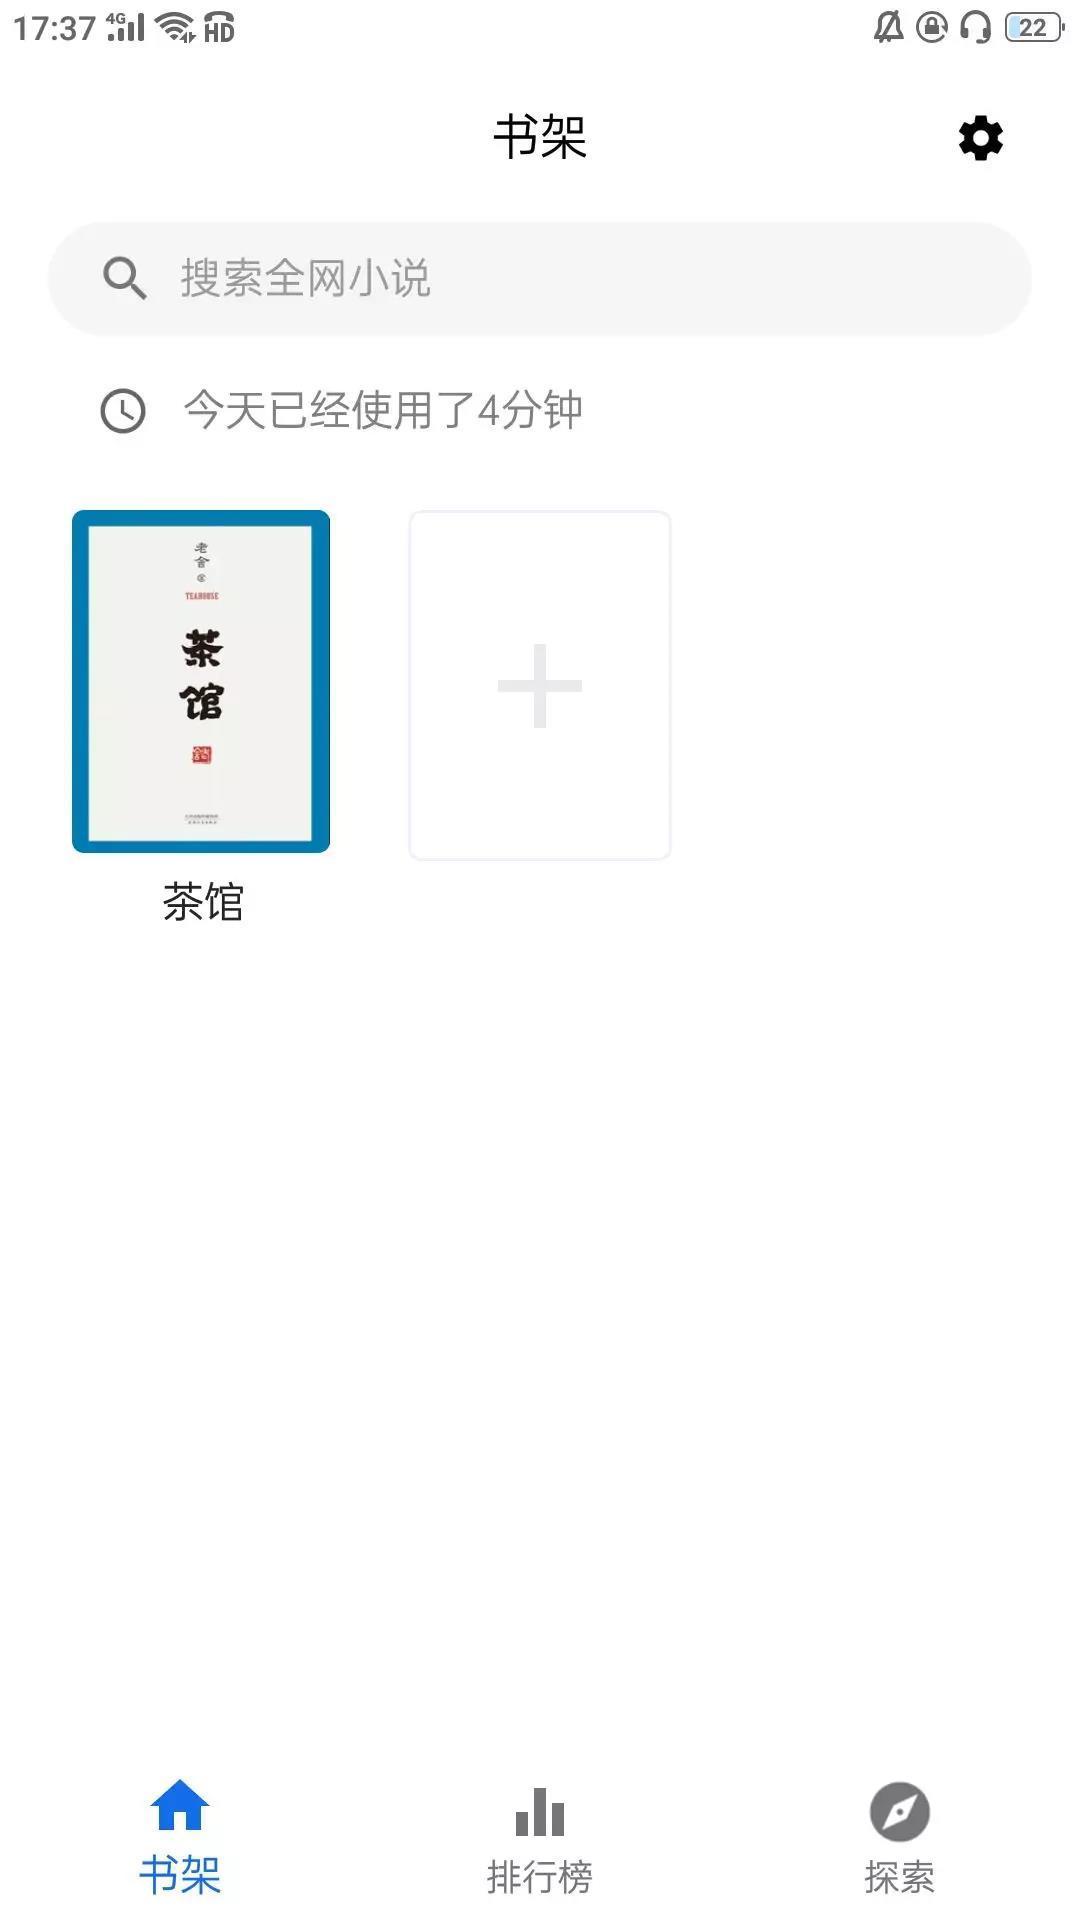 5ec661b6c2a9a83be5ceb405 蓝猫小说-小说免费阅读配赠书源